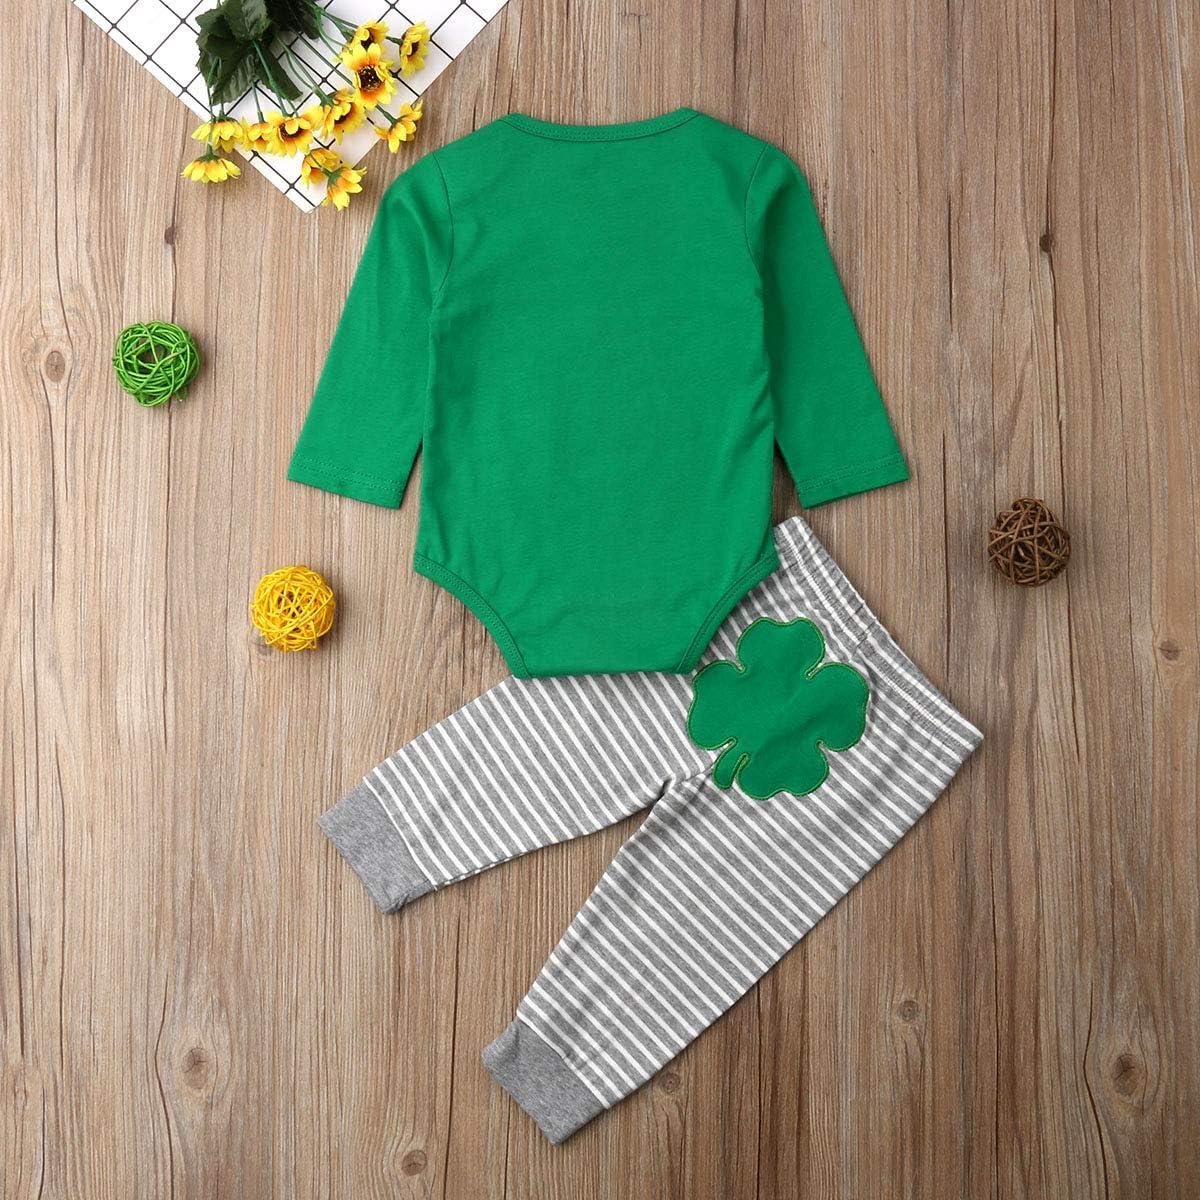 xkwyshop Newborn Infant Baby St Pants Outfit Baby Boys Girls Clover Clothes Set 2PCS Patricks Day Romper